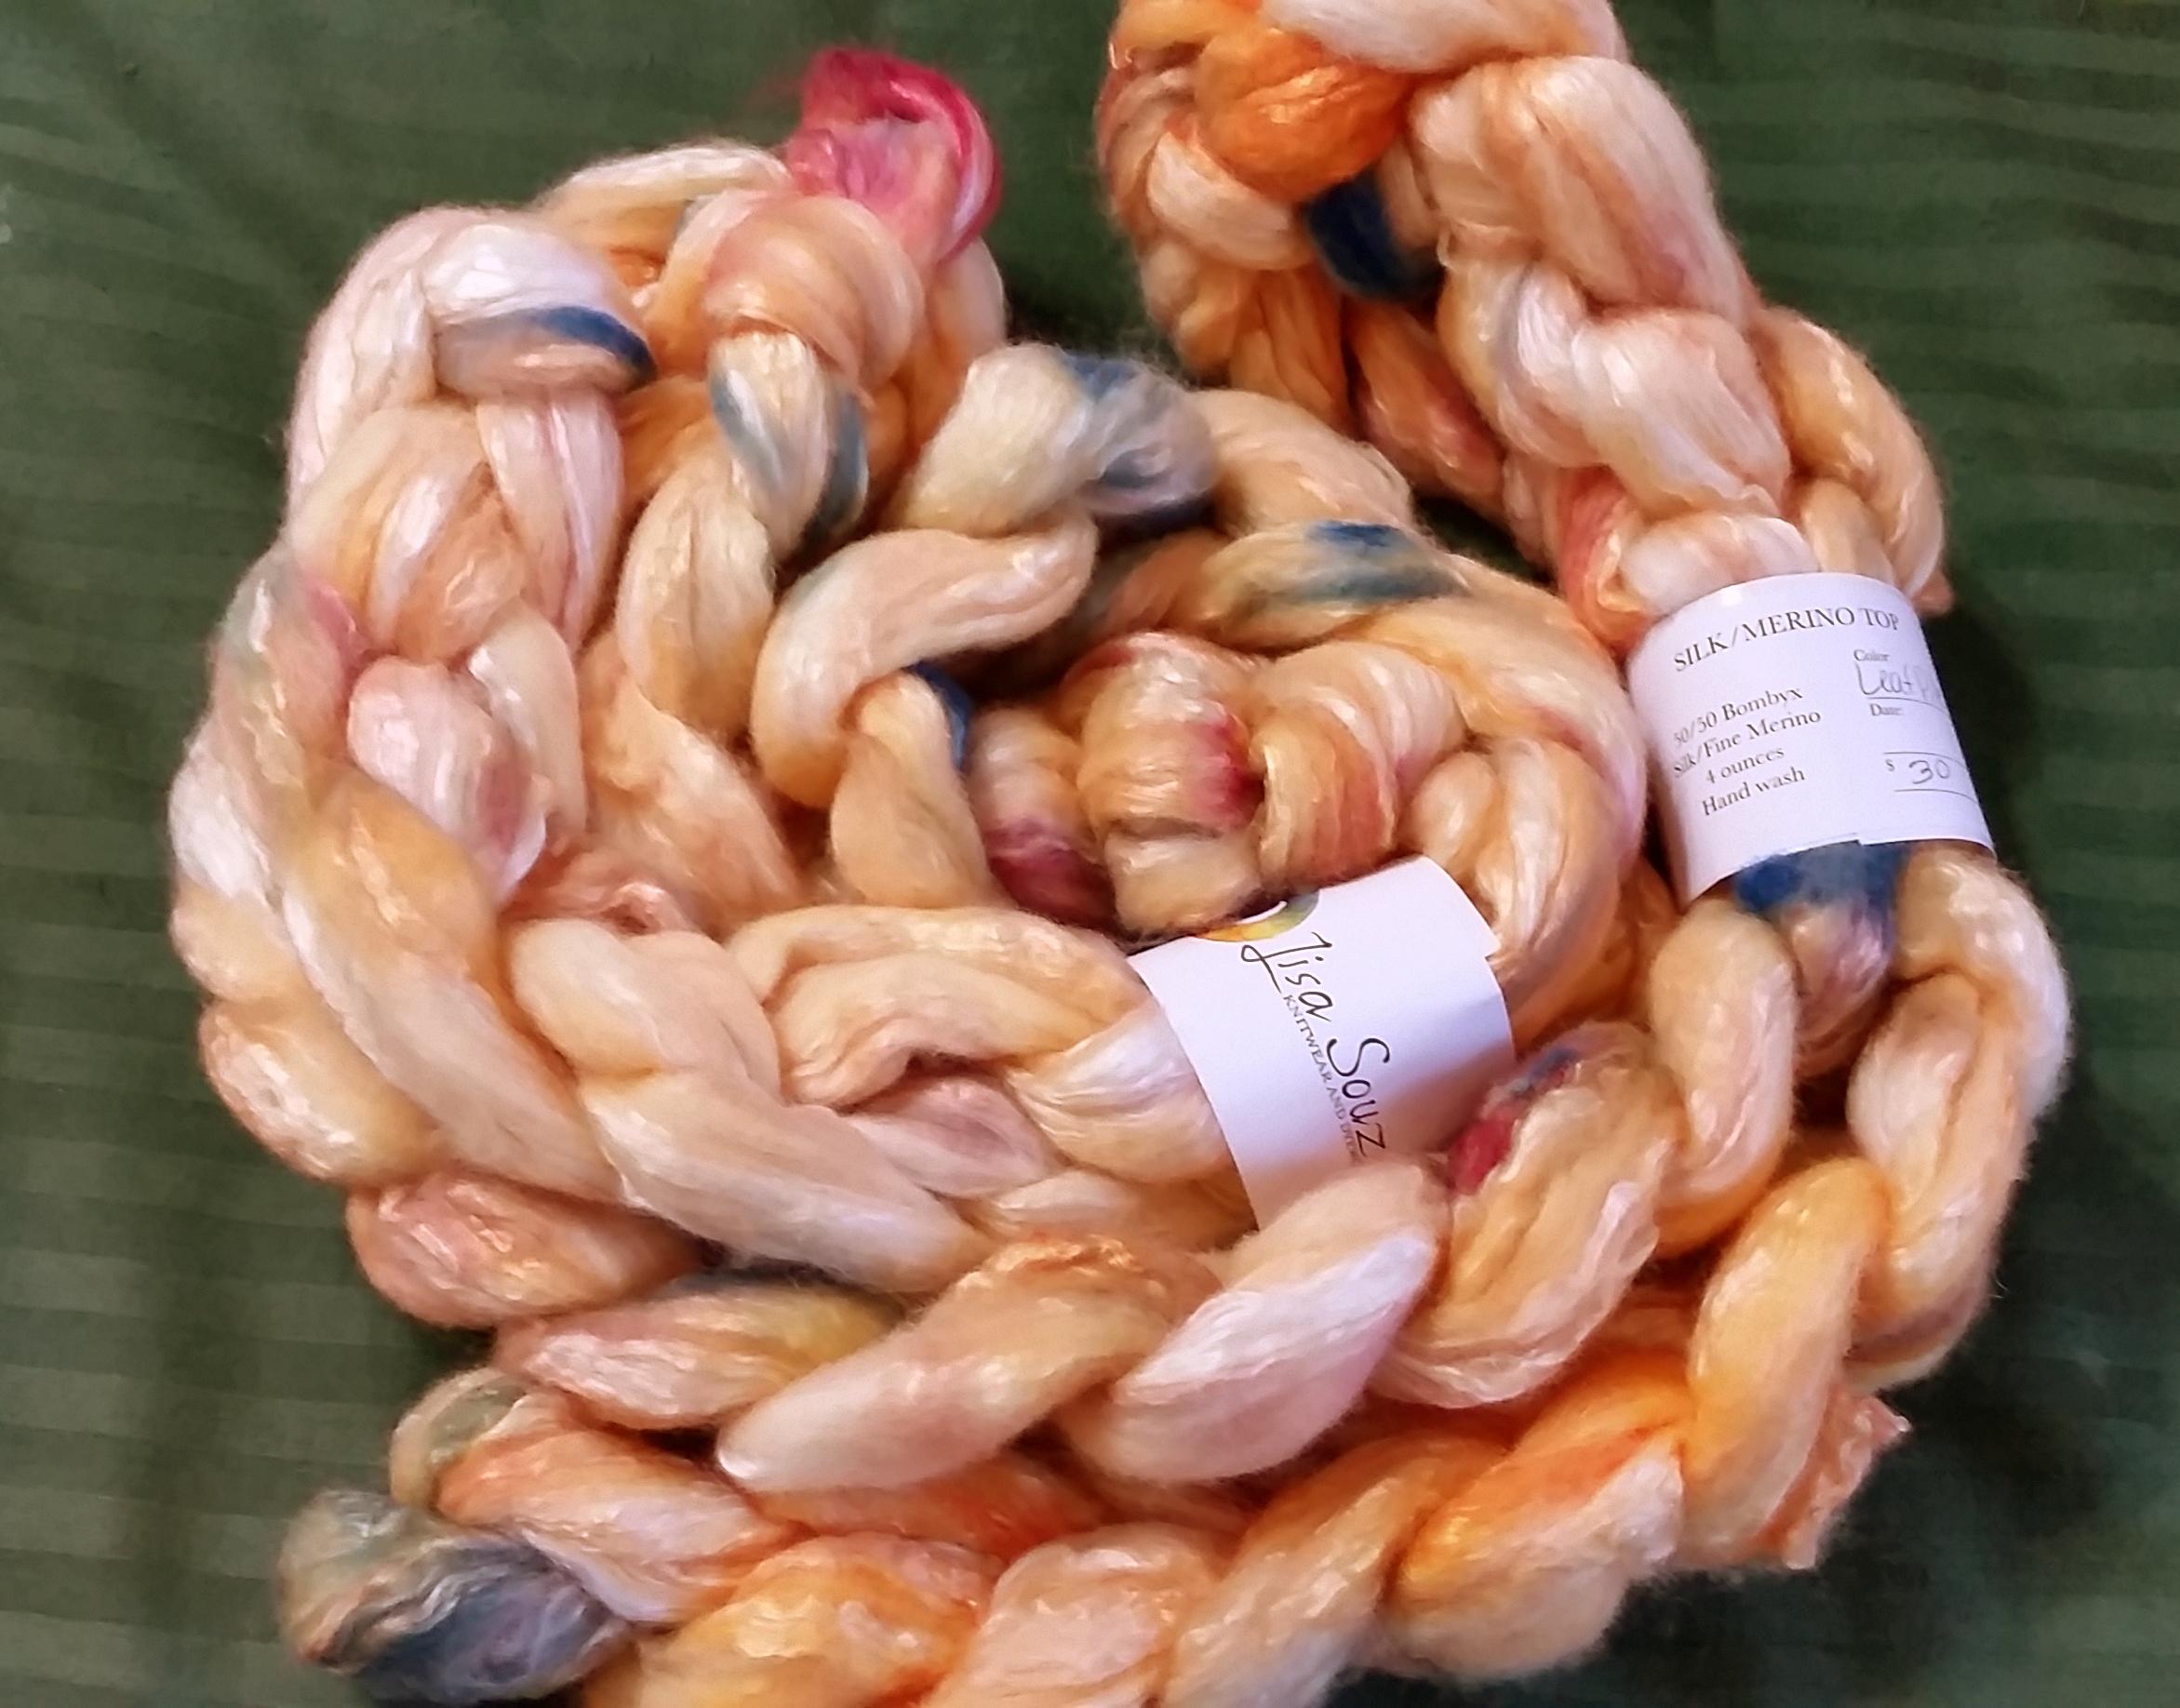 Bombyx Silk/Merino 50/50 from Lisa Souza Dyeworks